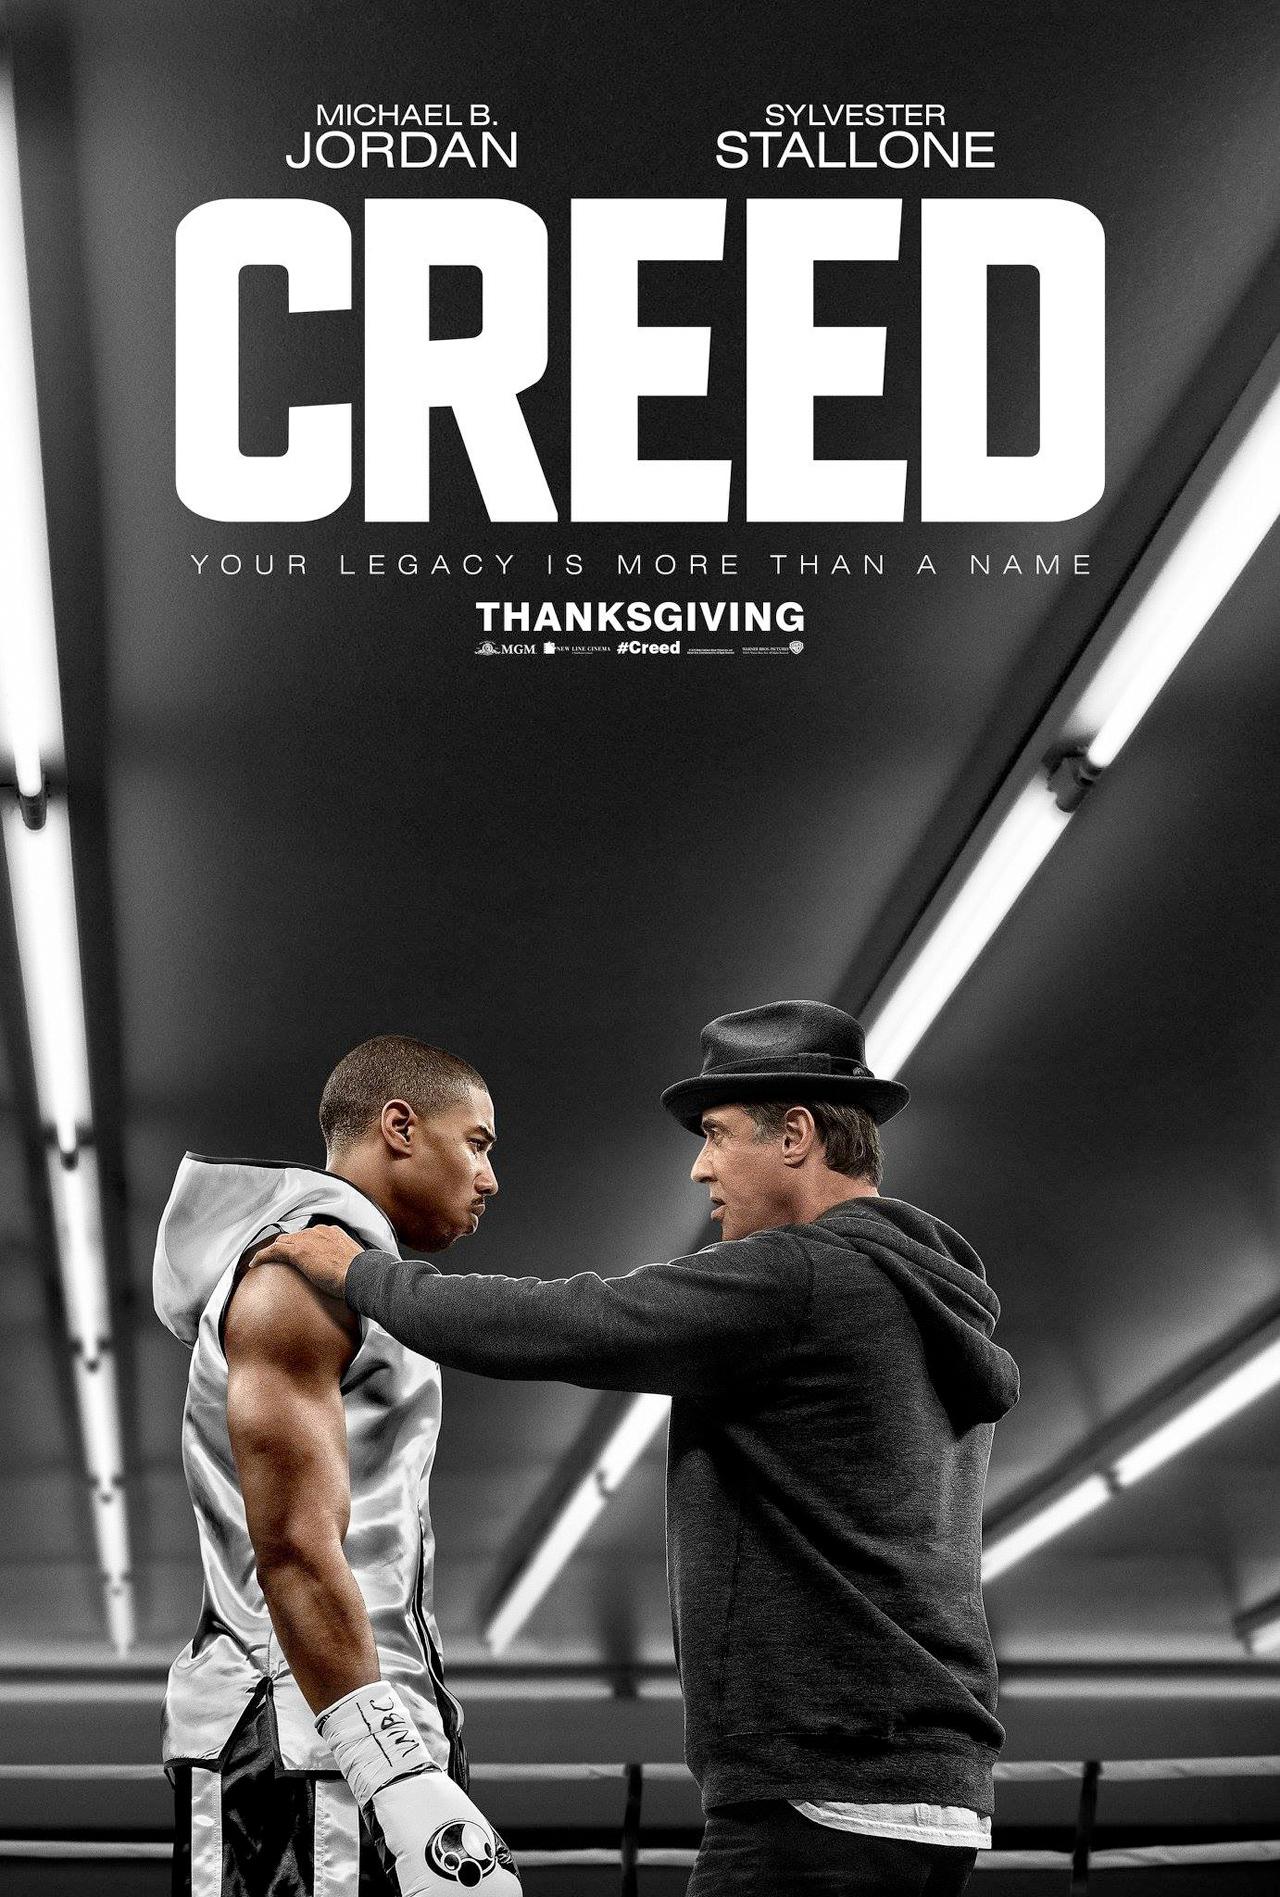 Creed Movies Individuality Theme